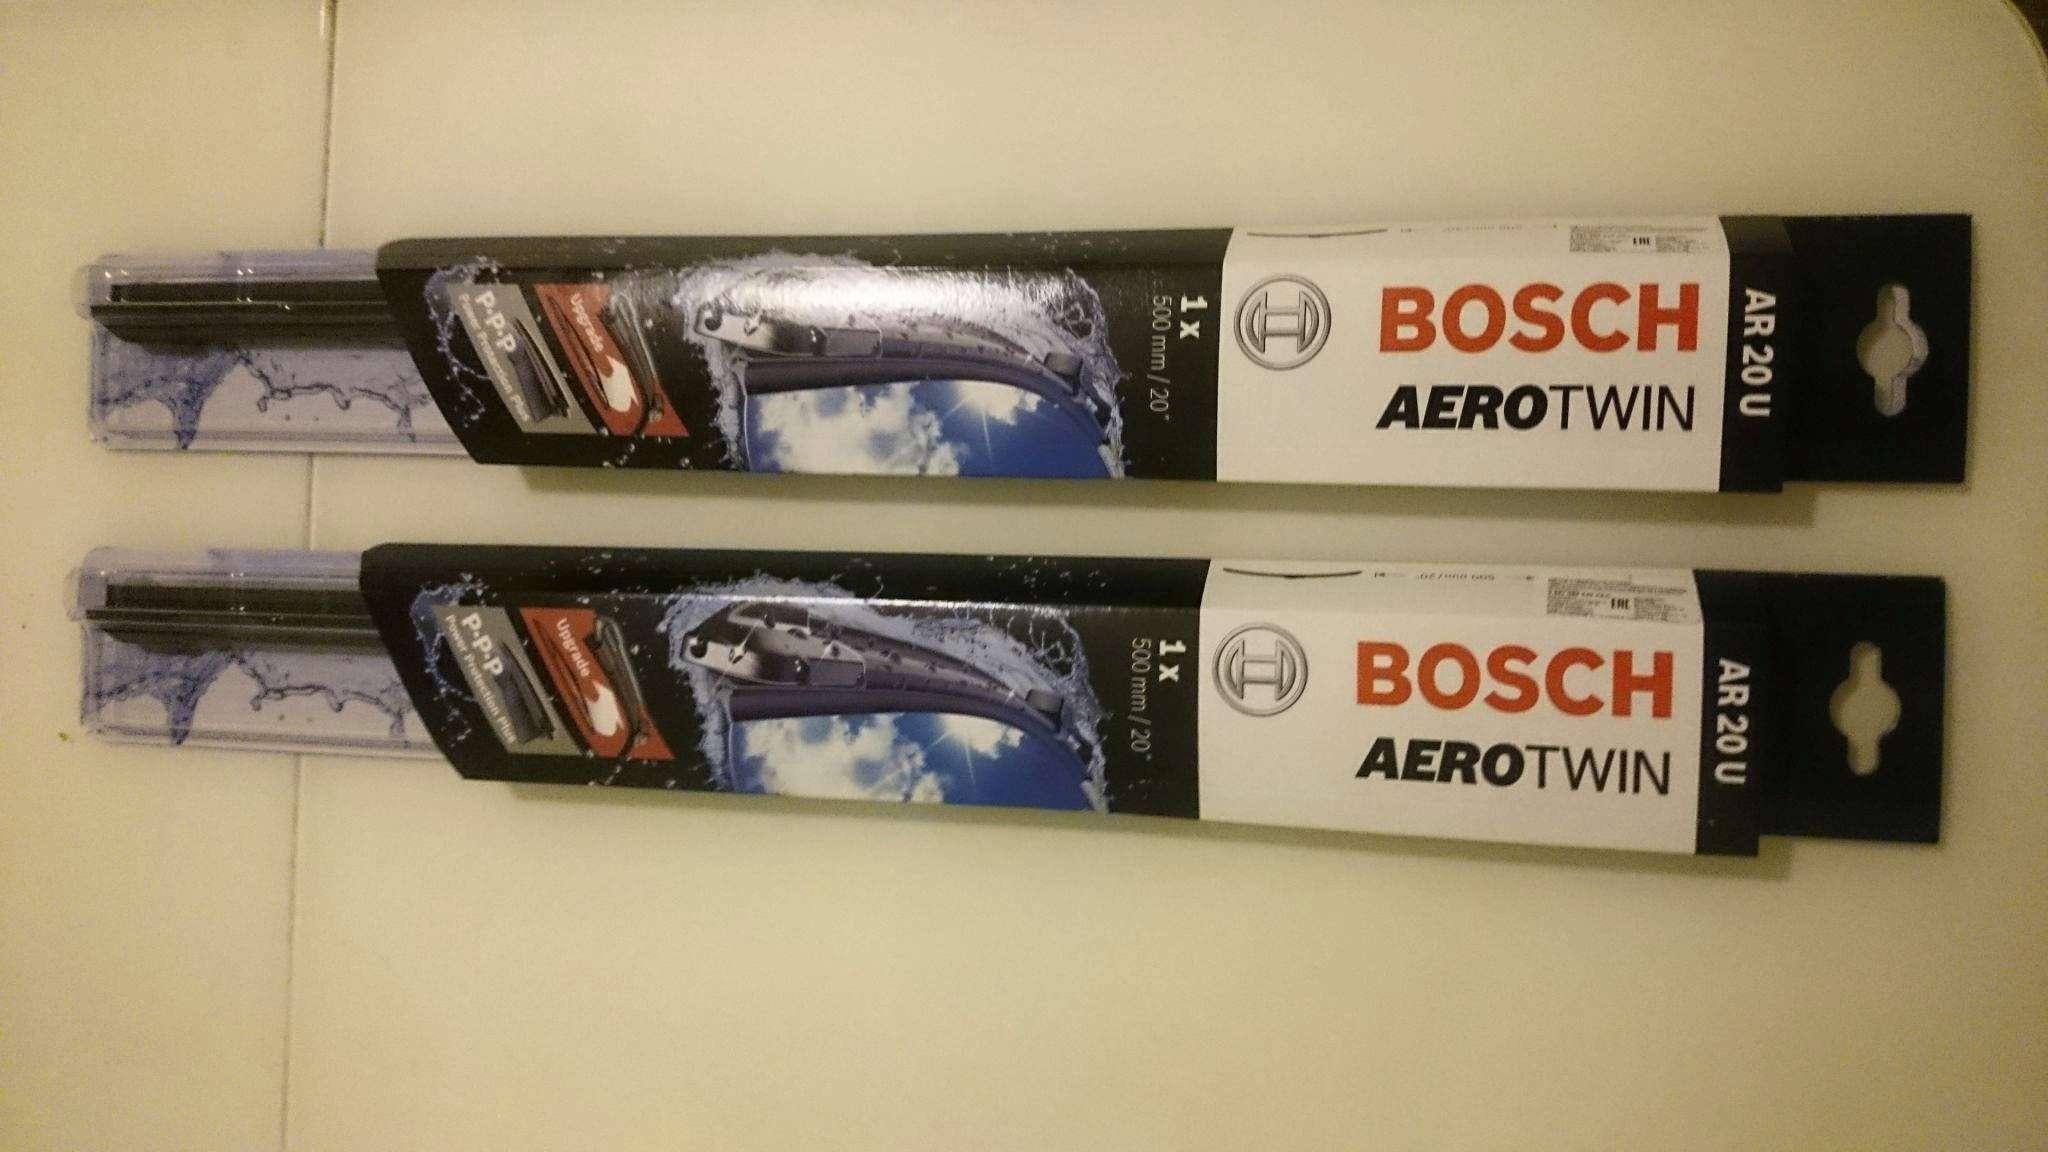 Aerotwin – флагманская серия Bosch